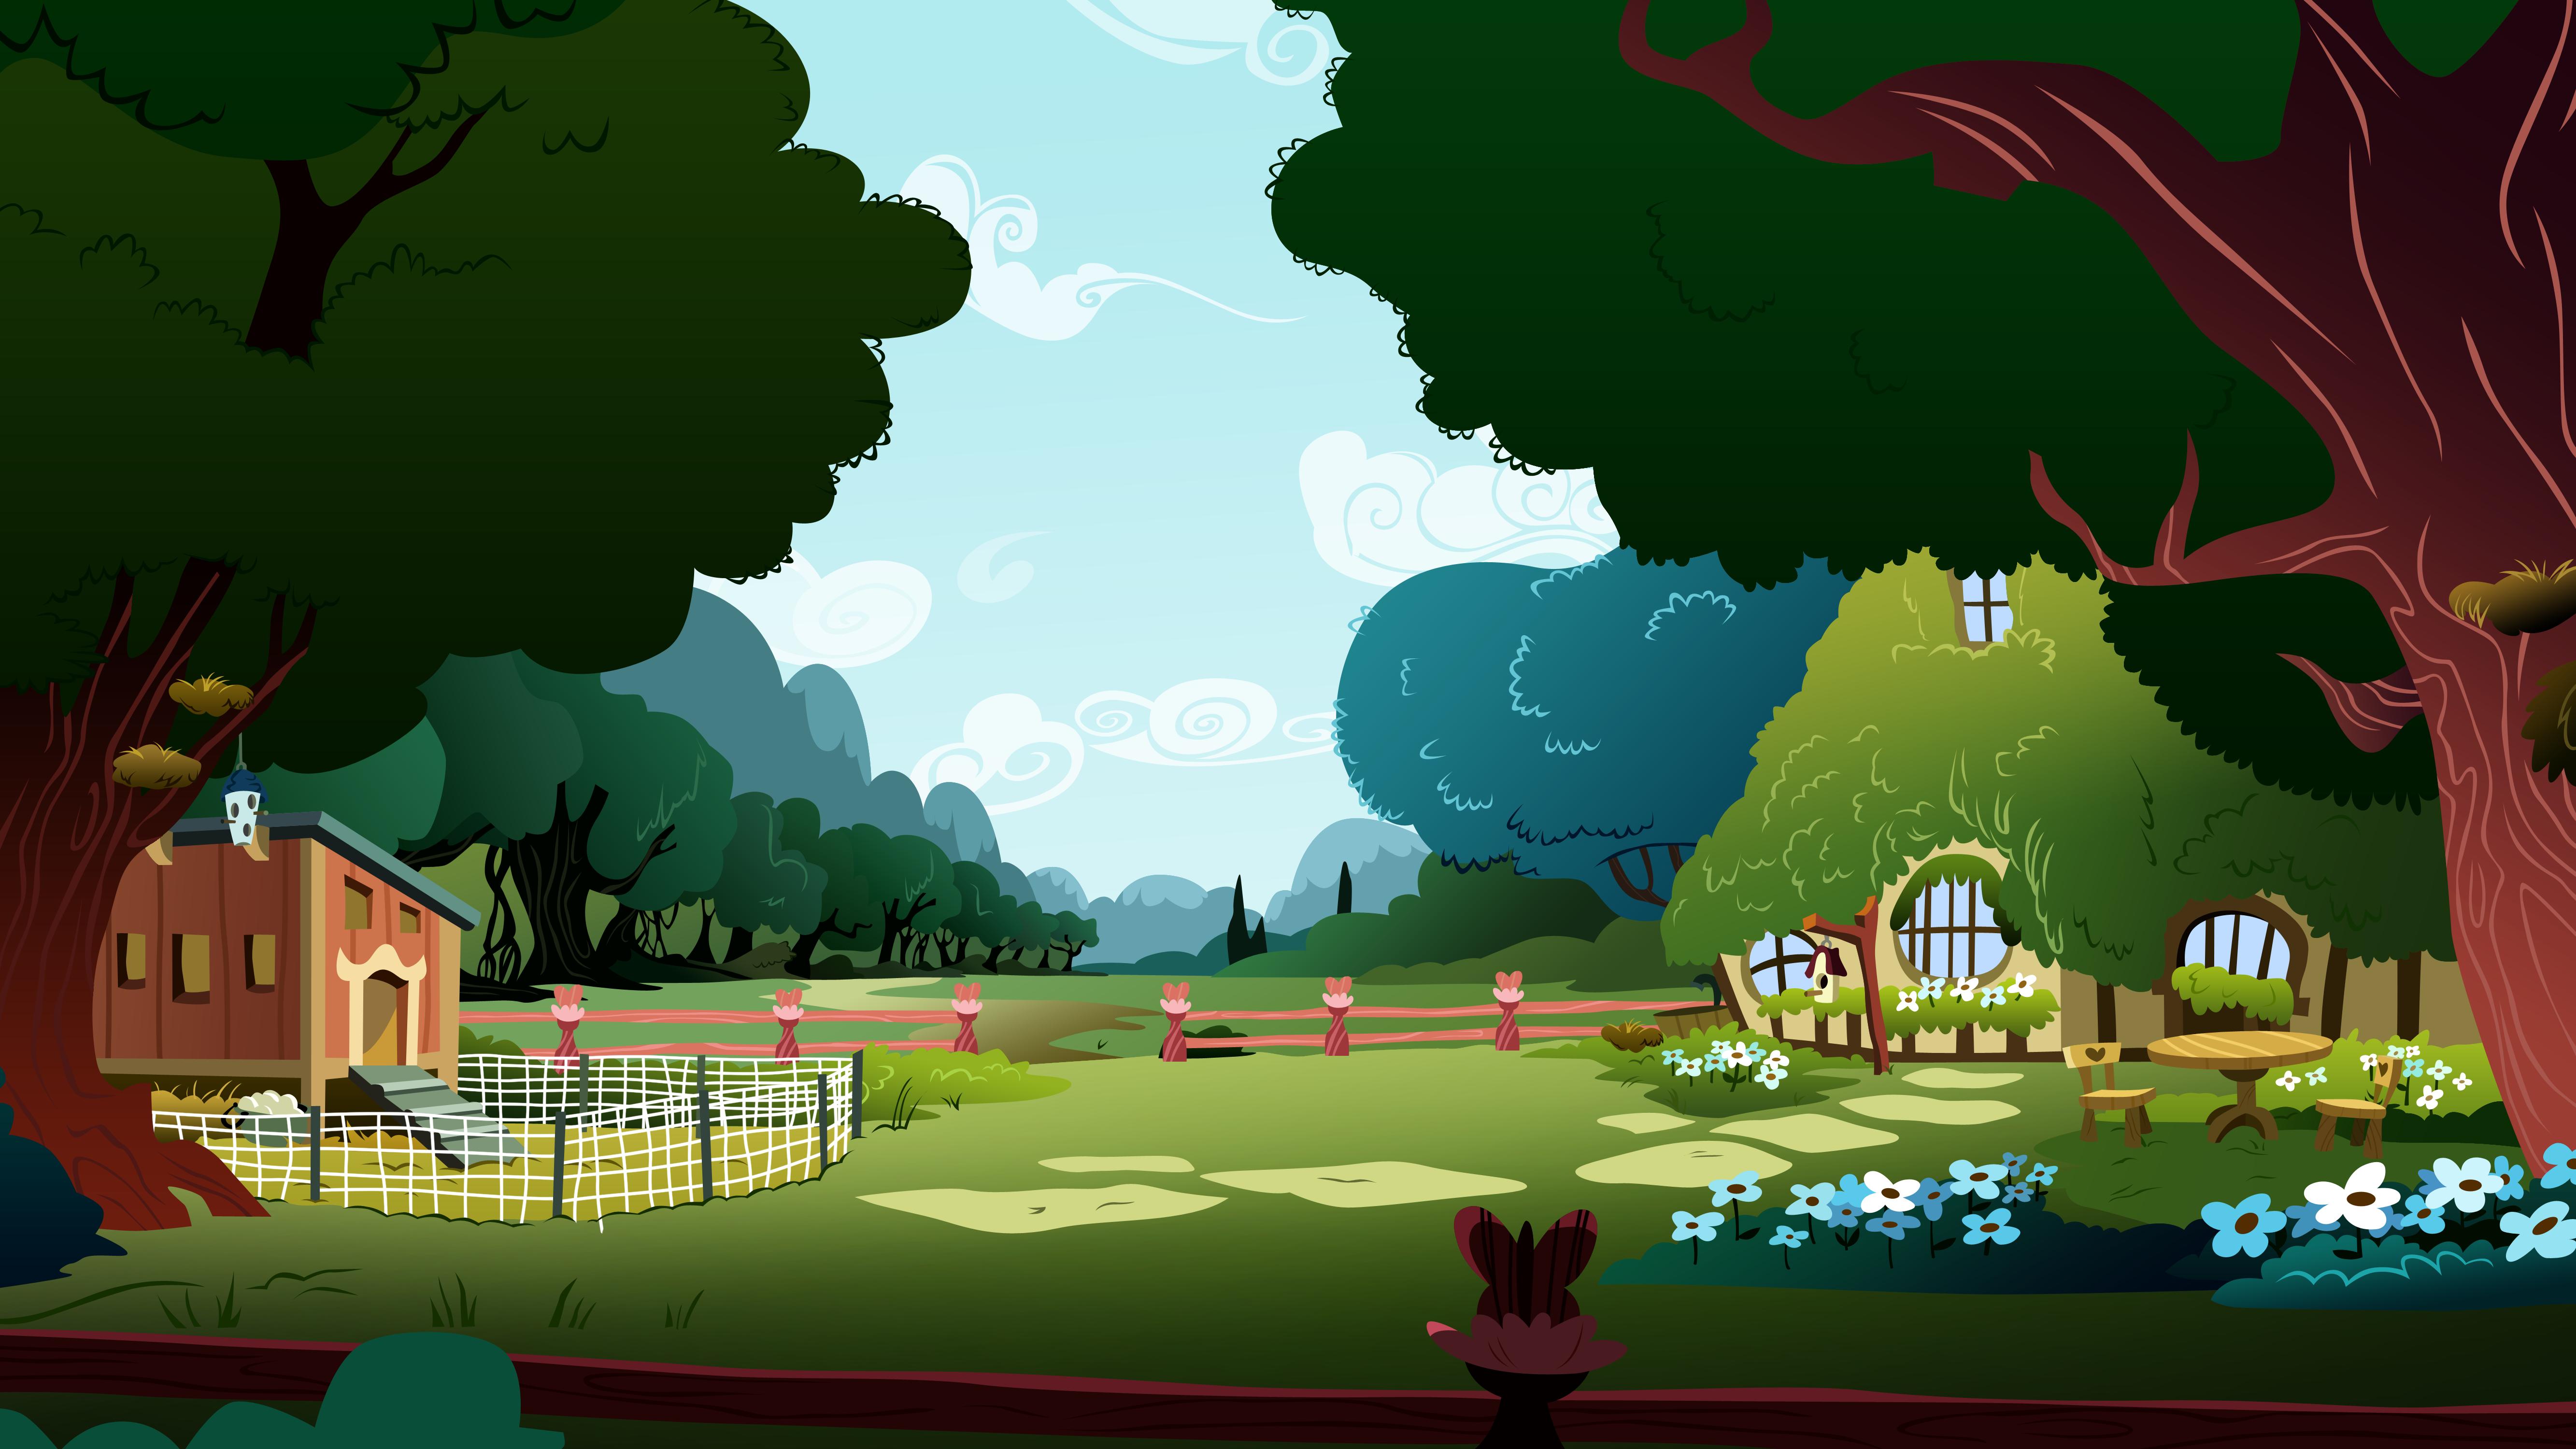 Fluttershy's backyard by Kooner-cz